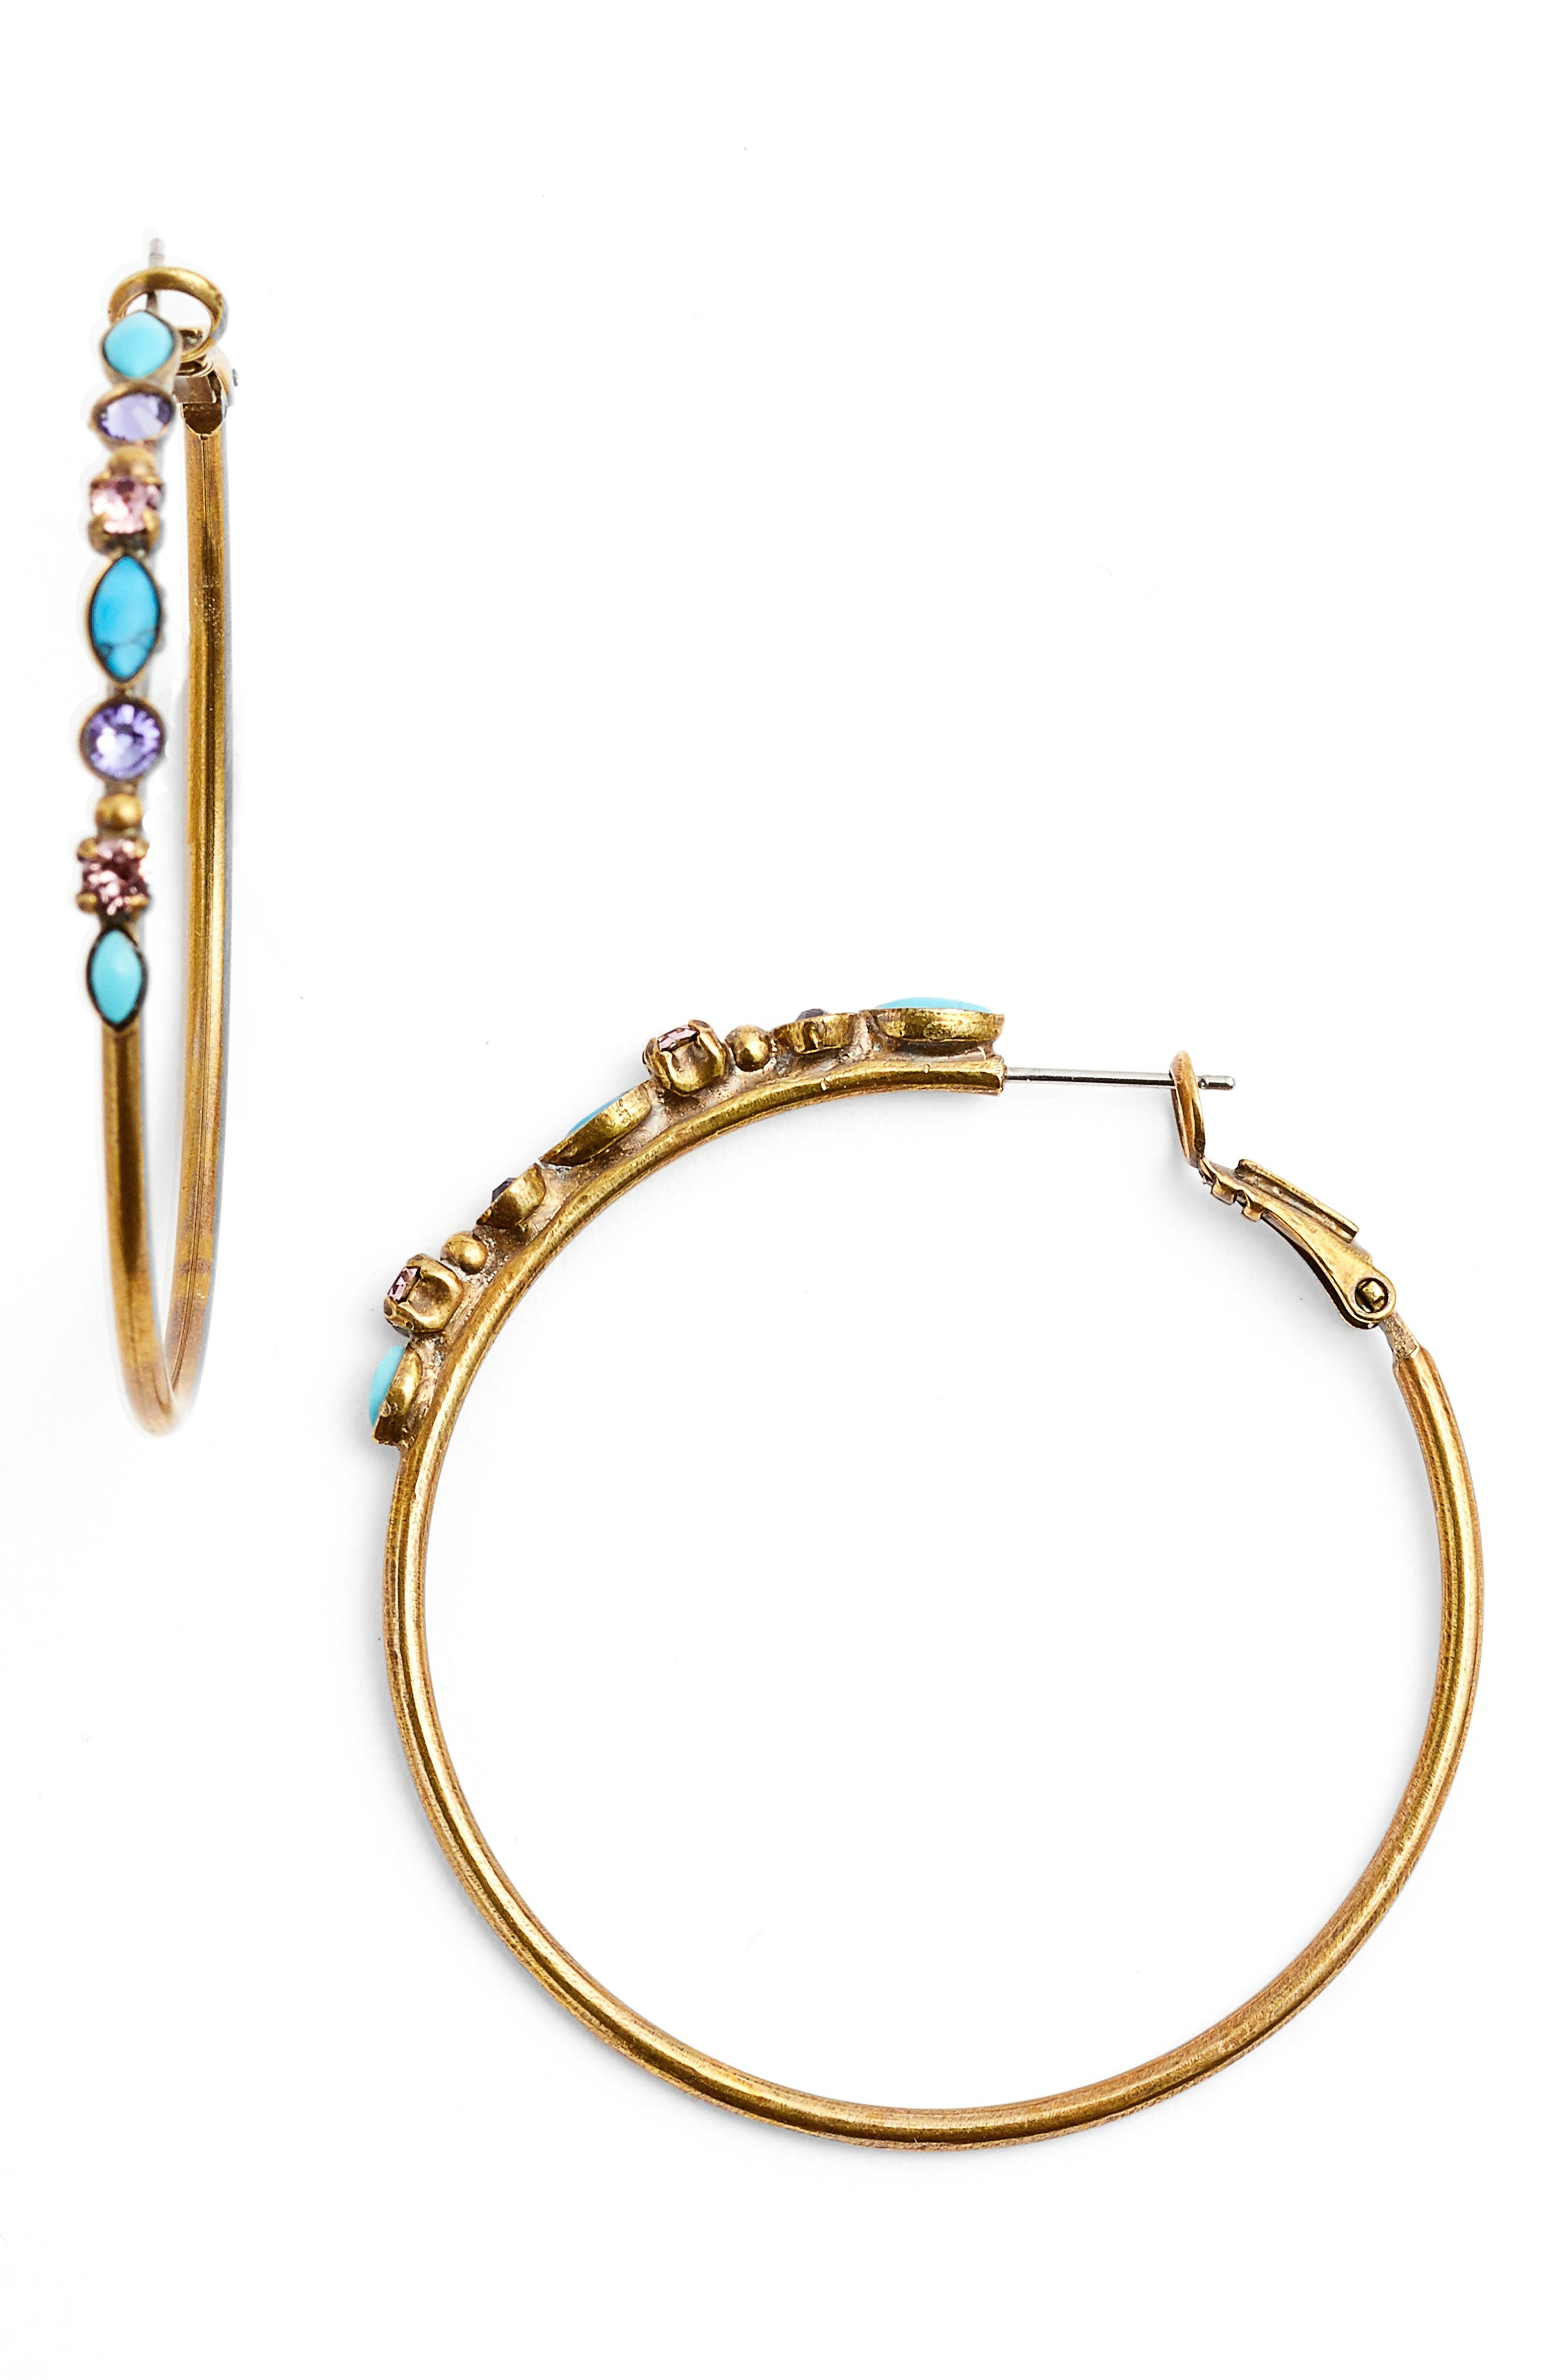 Alternate Image 1 Selected - Sorrelli Mixed Media Large Hoop Earrings